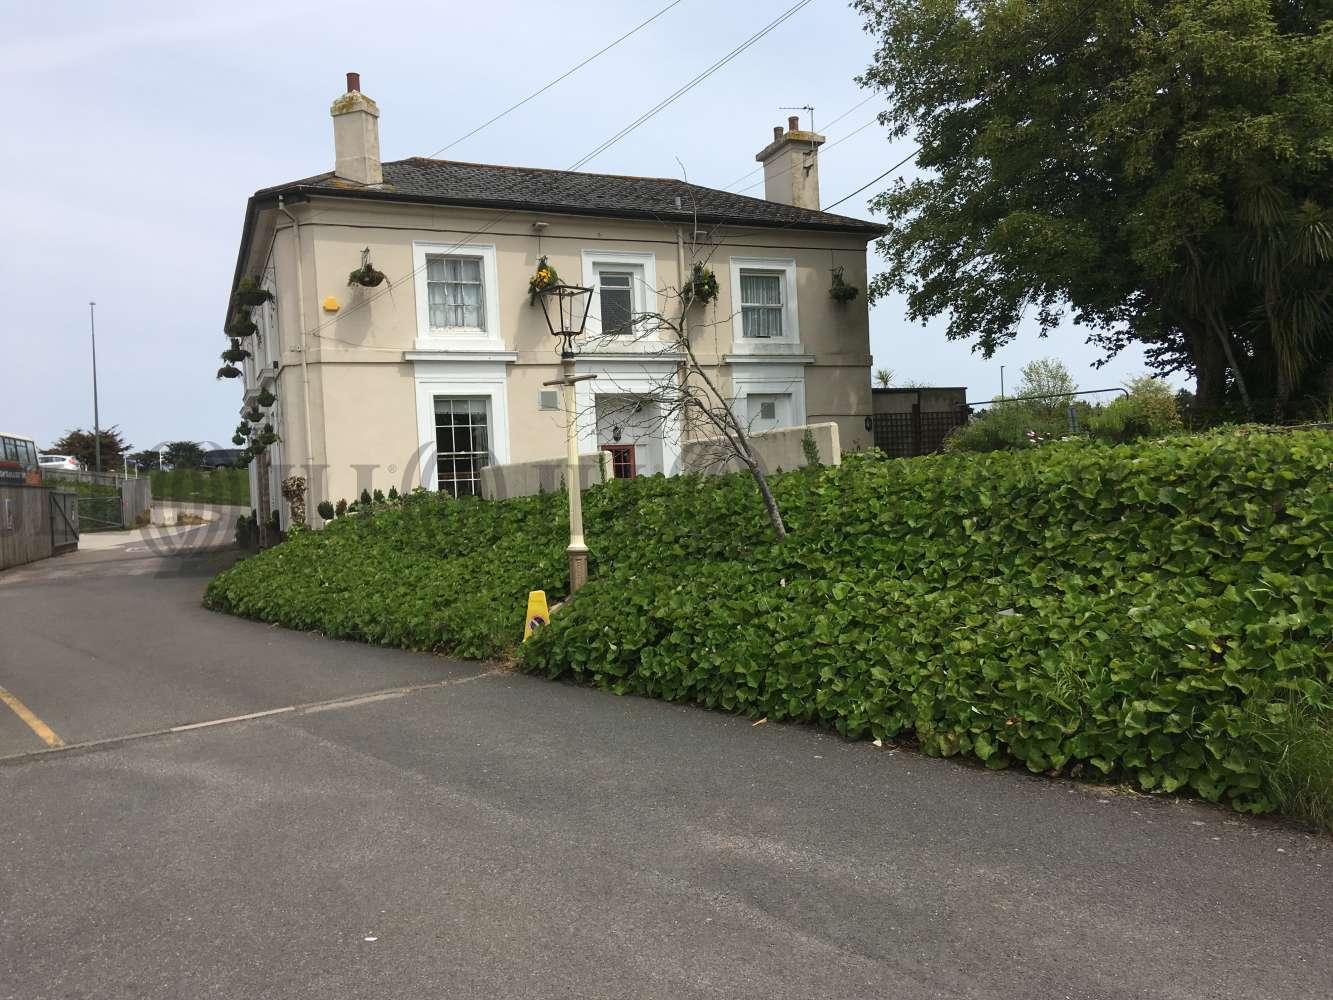 Pub Brixham, TQ5 0LL - Weary Ploughman - 1451